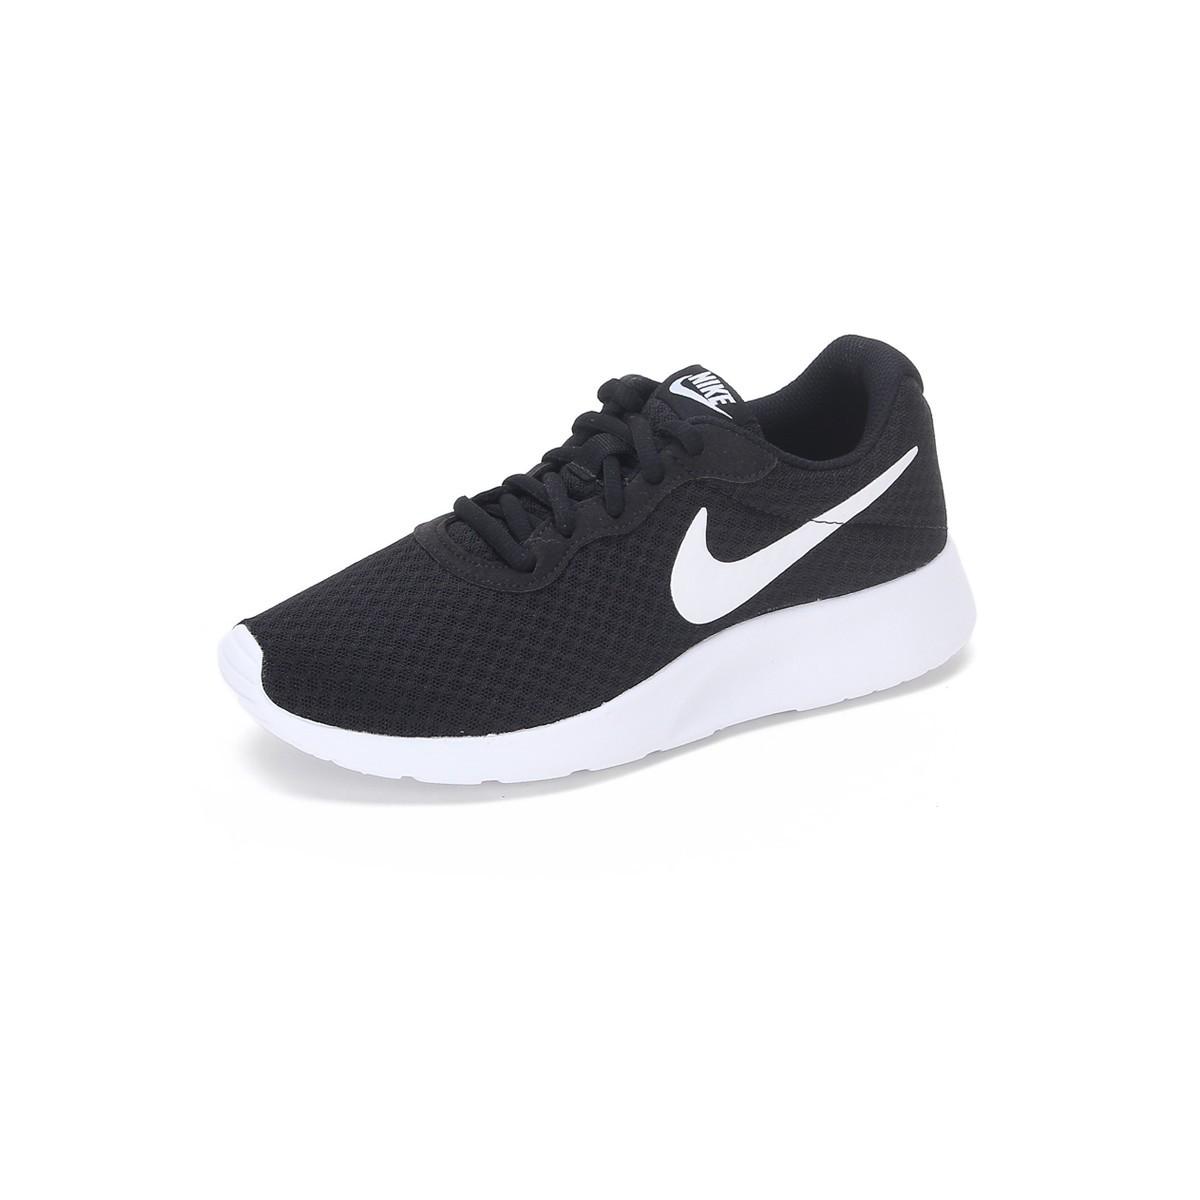 NIKE 耐克 Tanjun 女士休闲运动鞋 812655-011 黑色/白色 36